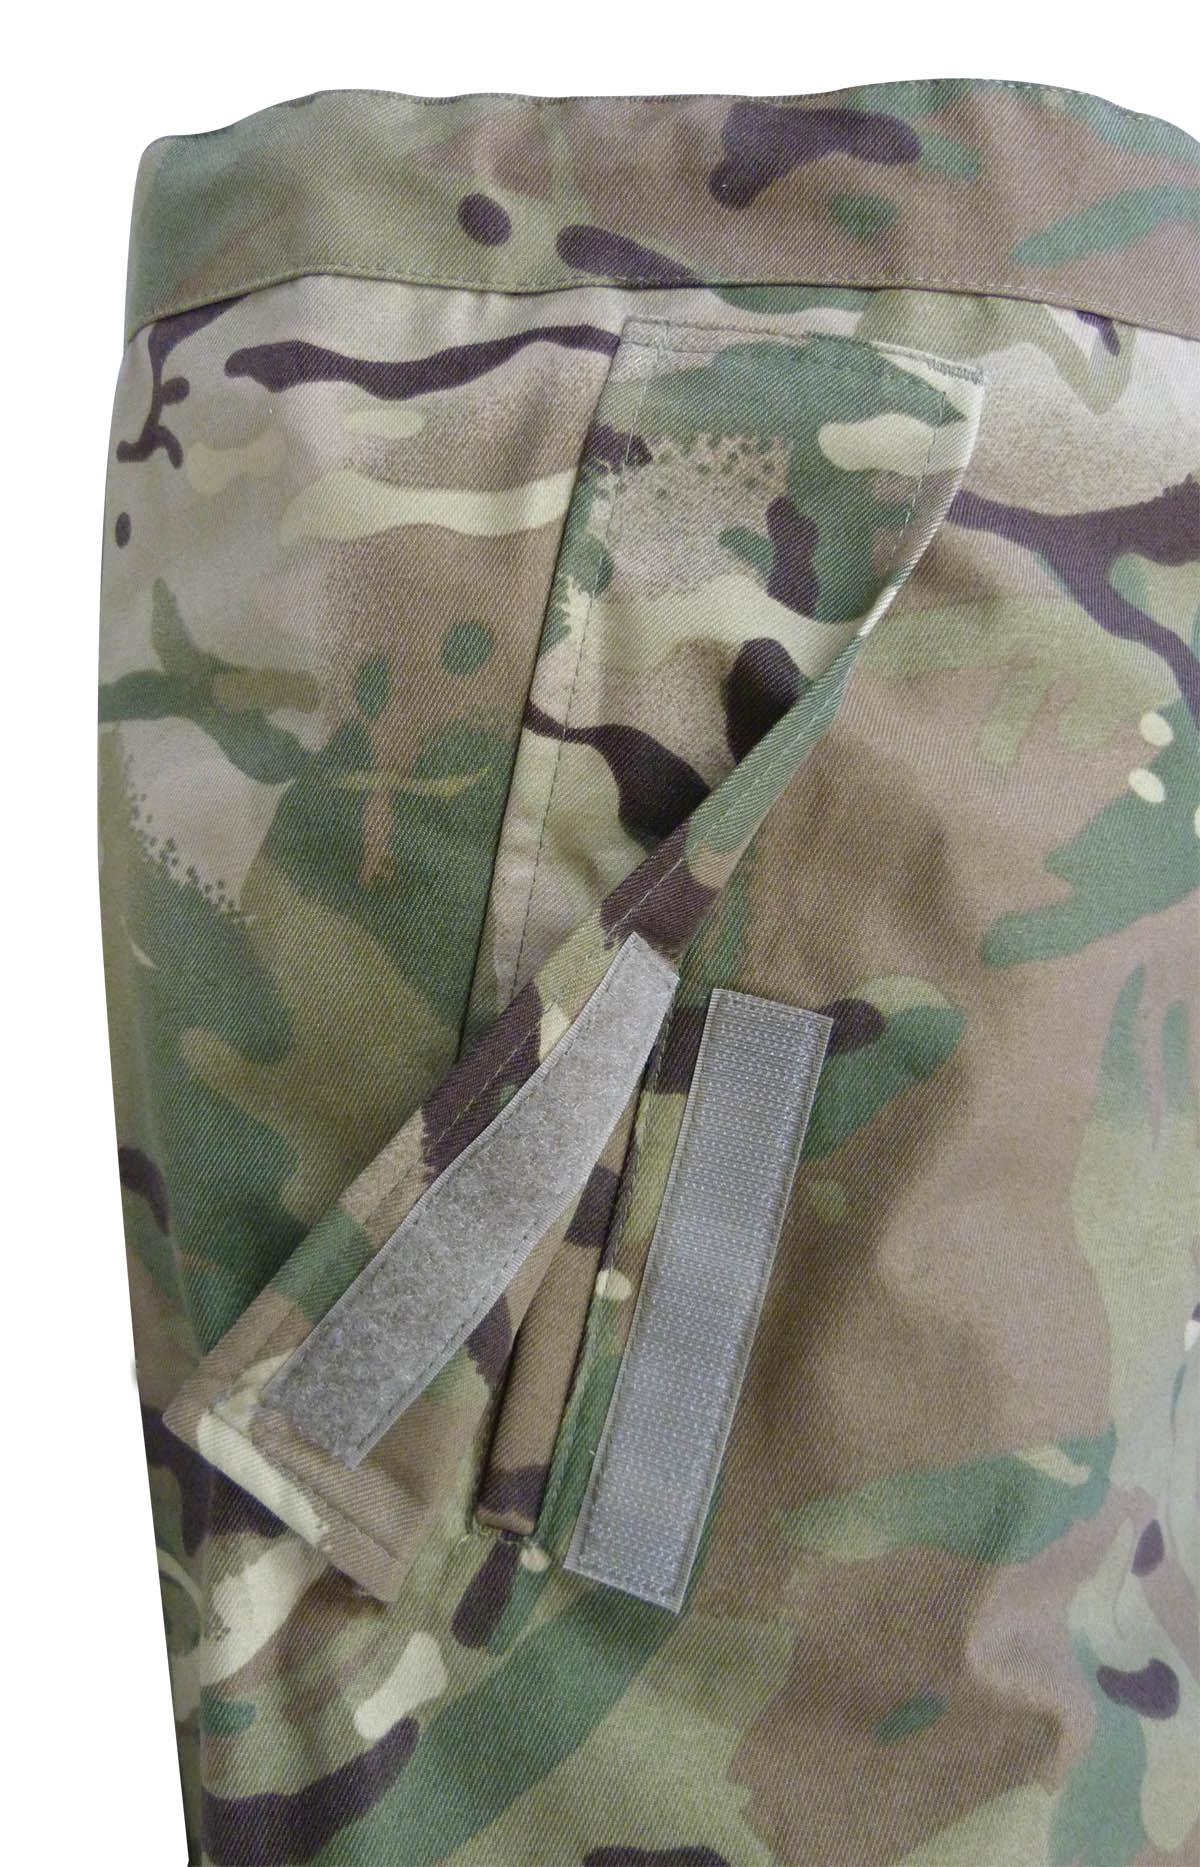 ff55f5afa2bcf New British MTP Goretex Trousers by British Army